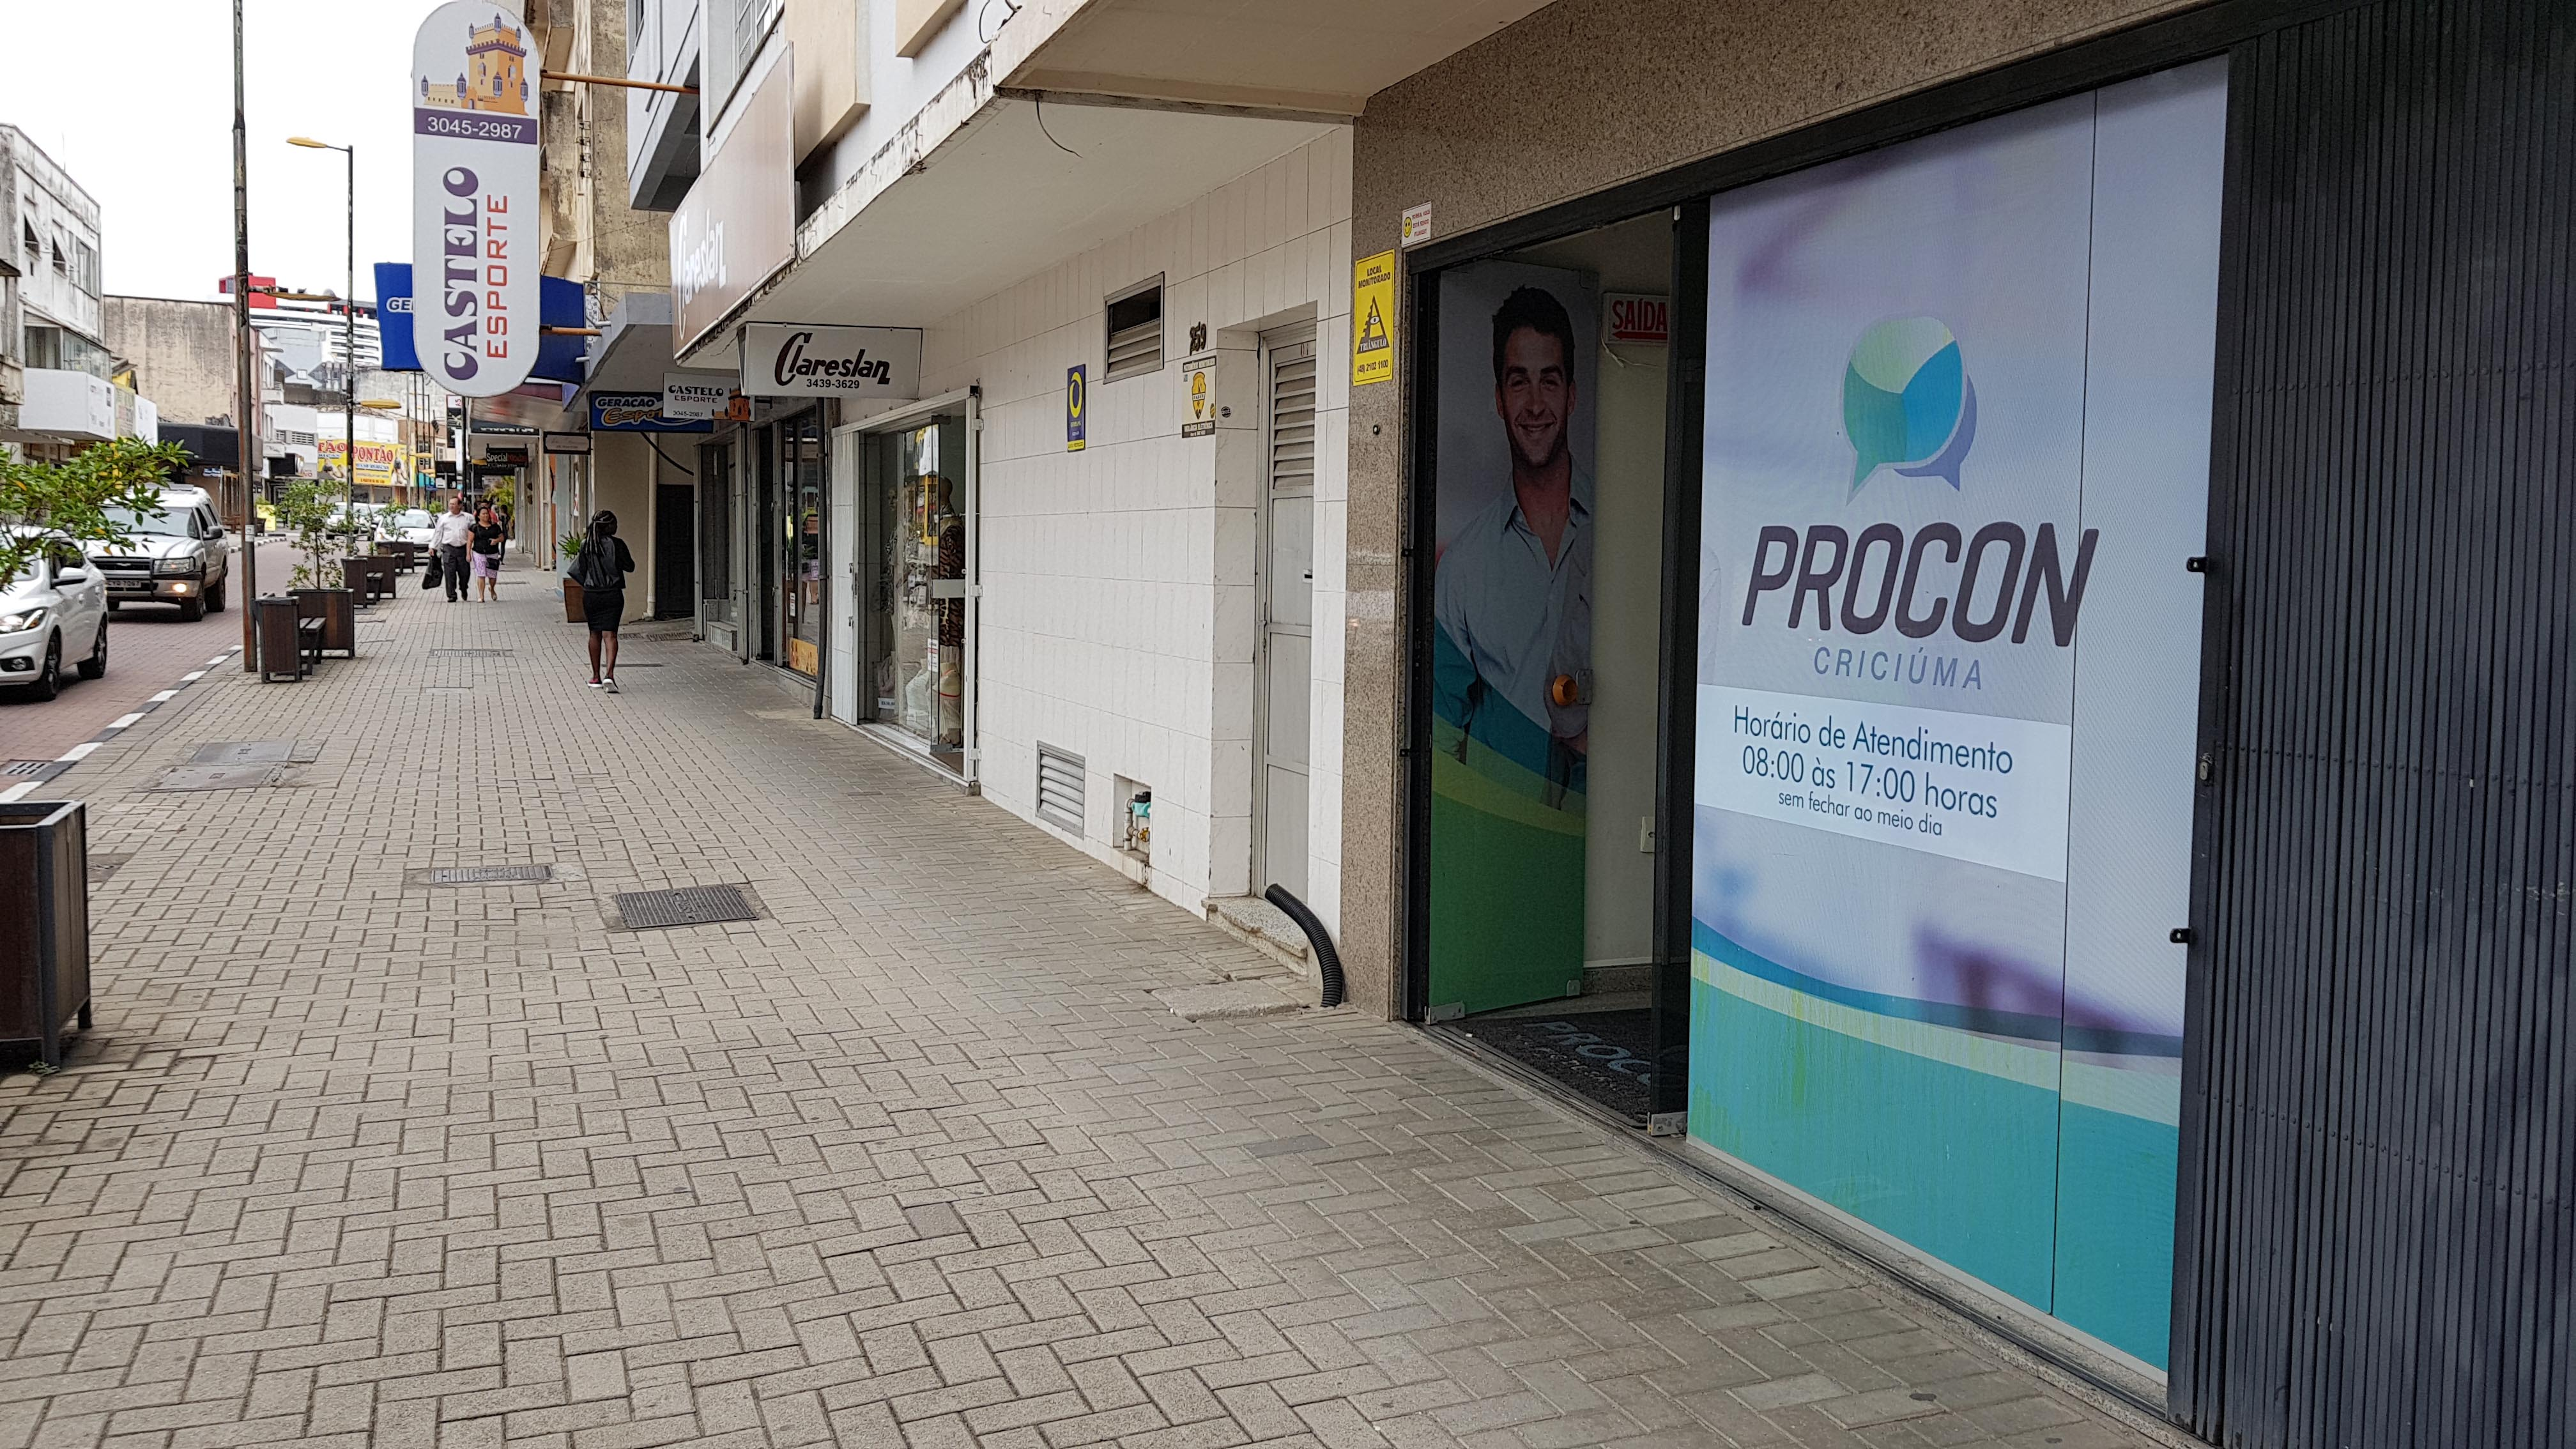 Prefeitura Municipal de Criciúma - Procon de Criciúma amplia horário de atendimento ao público